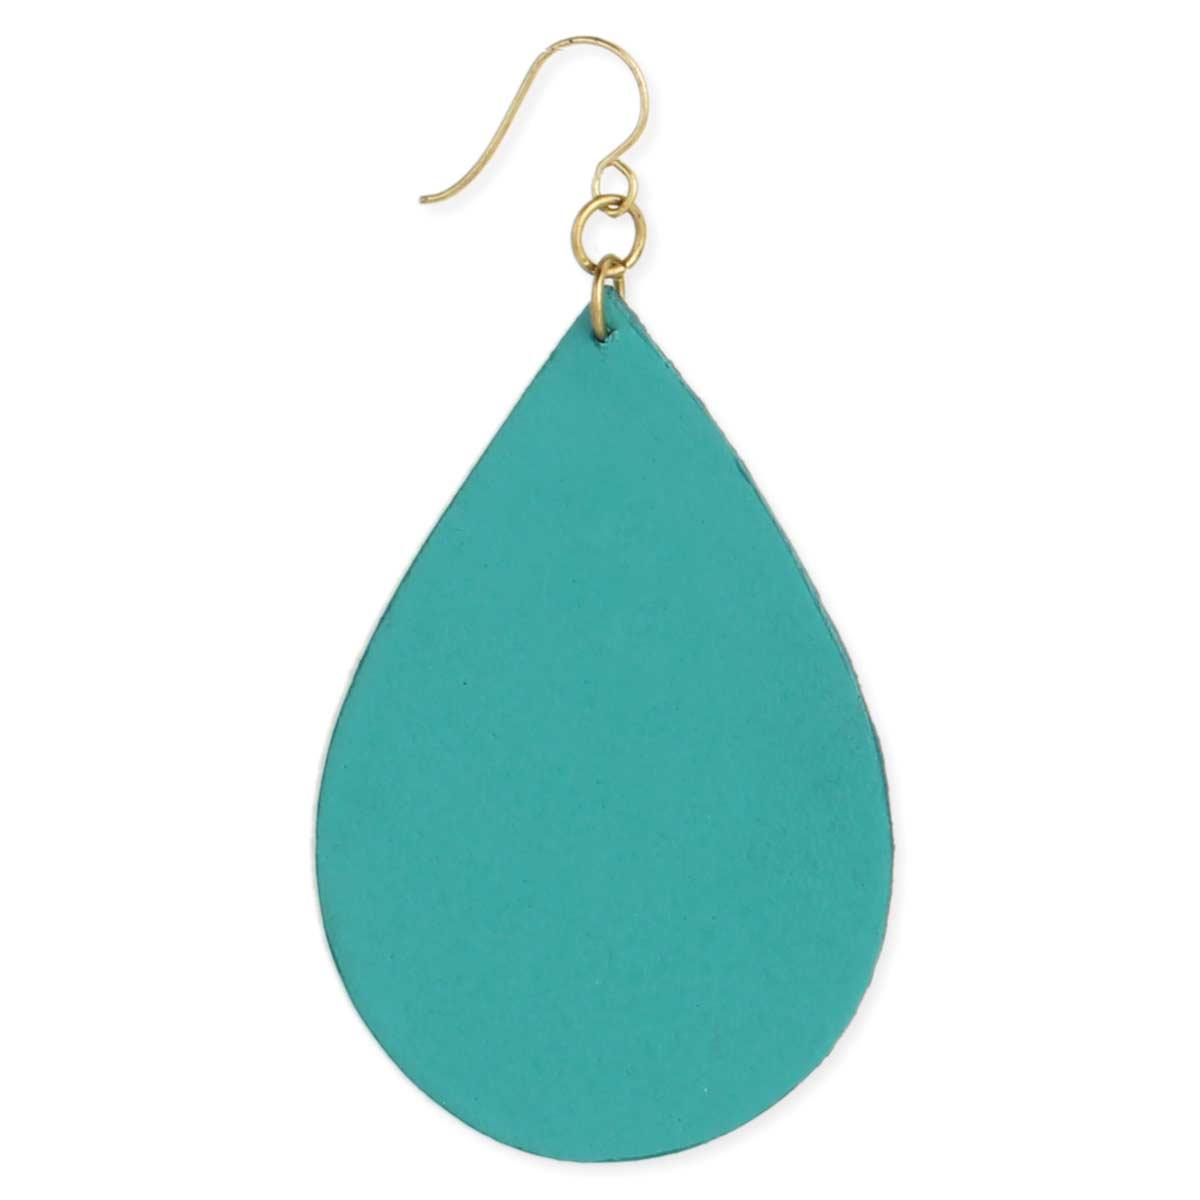 Turquoise Leather Teardrop Earring